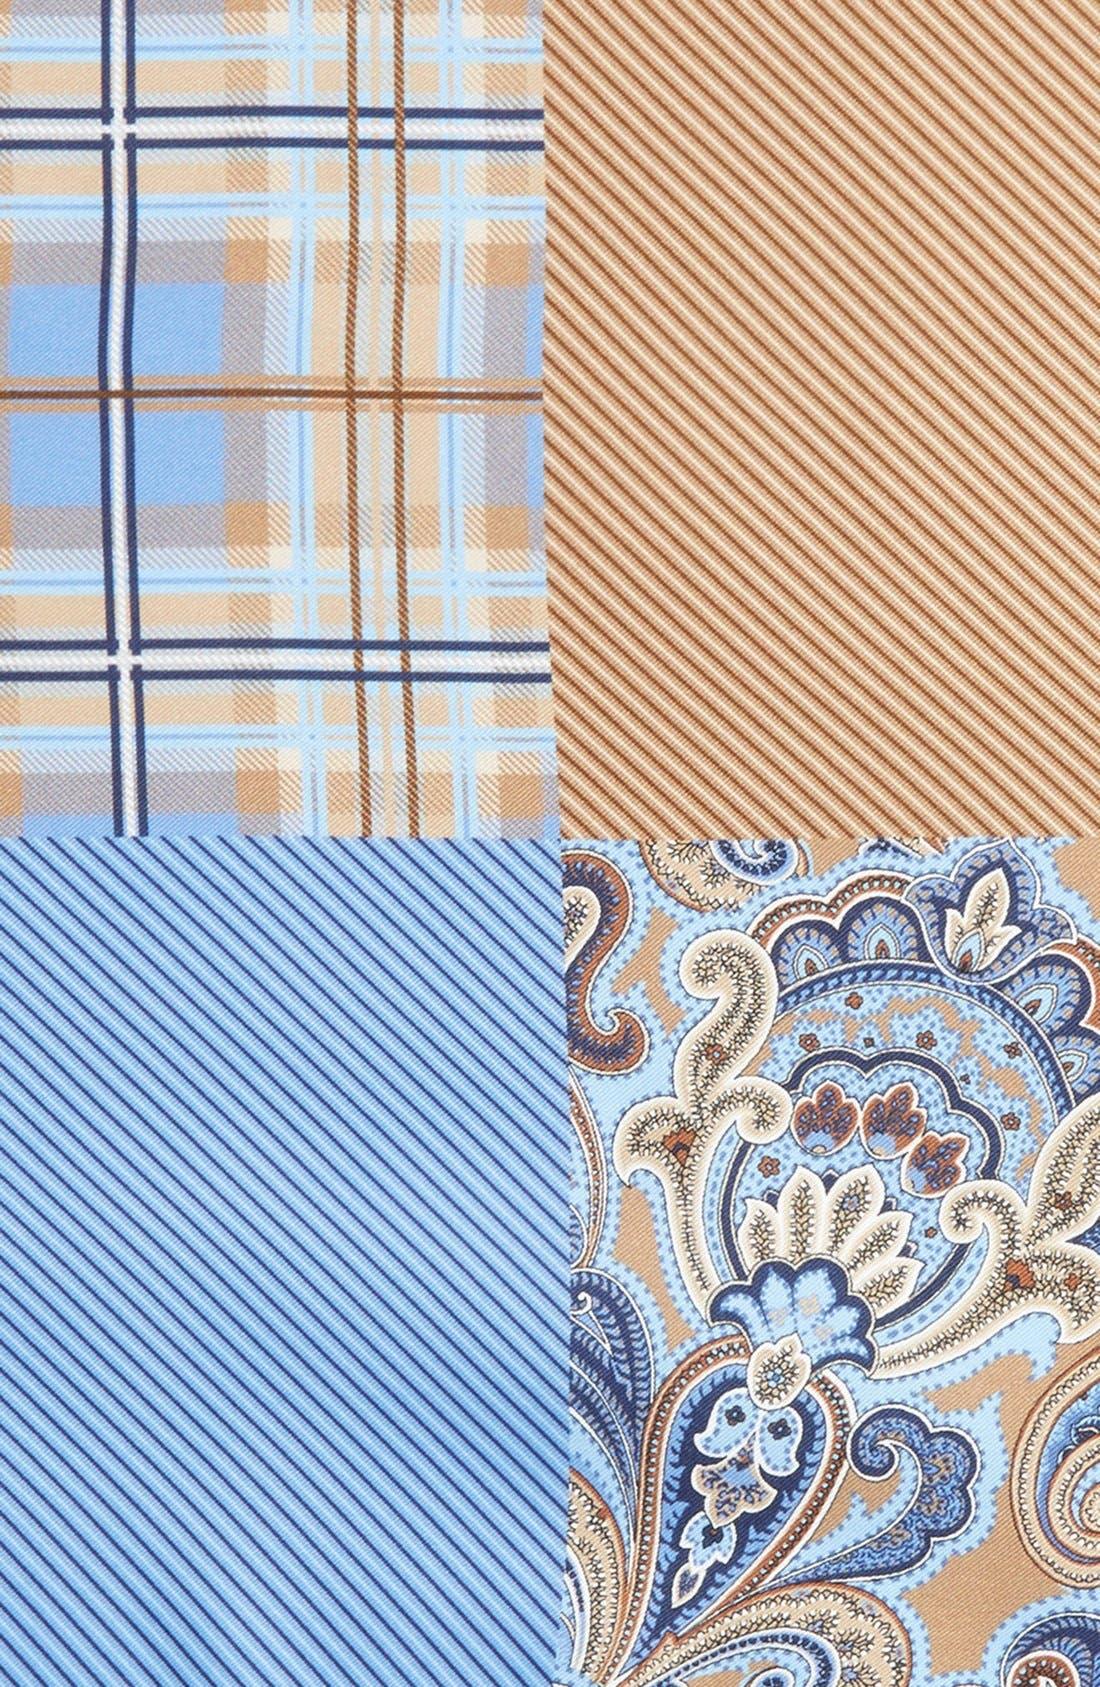 'Three Panel' Silk Pocket Square,                             Alternate thumbnail 3, color,                             BROWN/BLUE